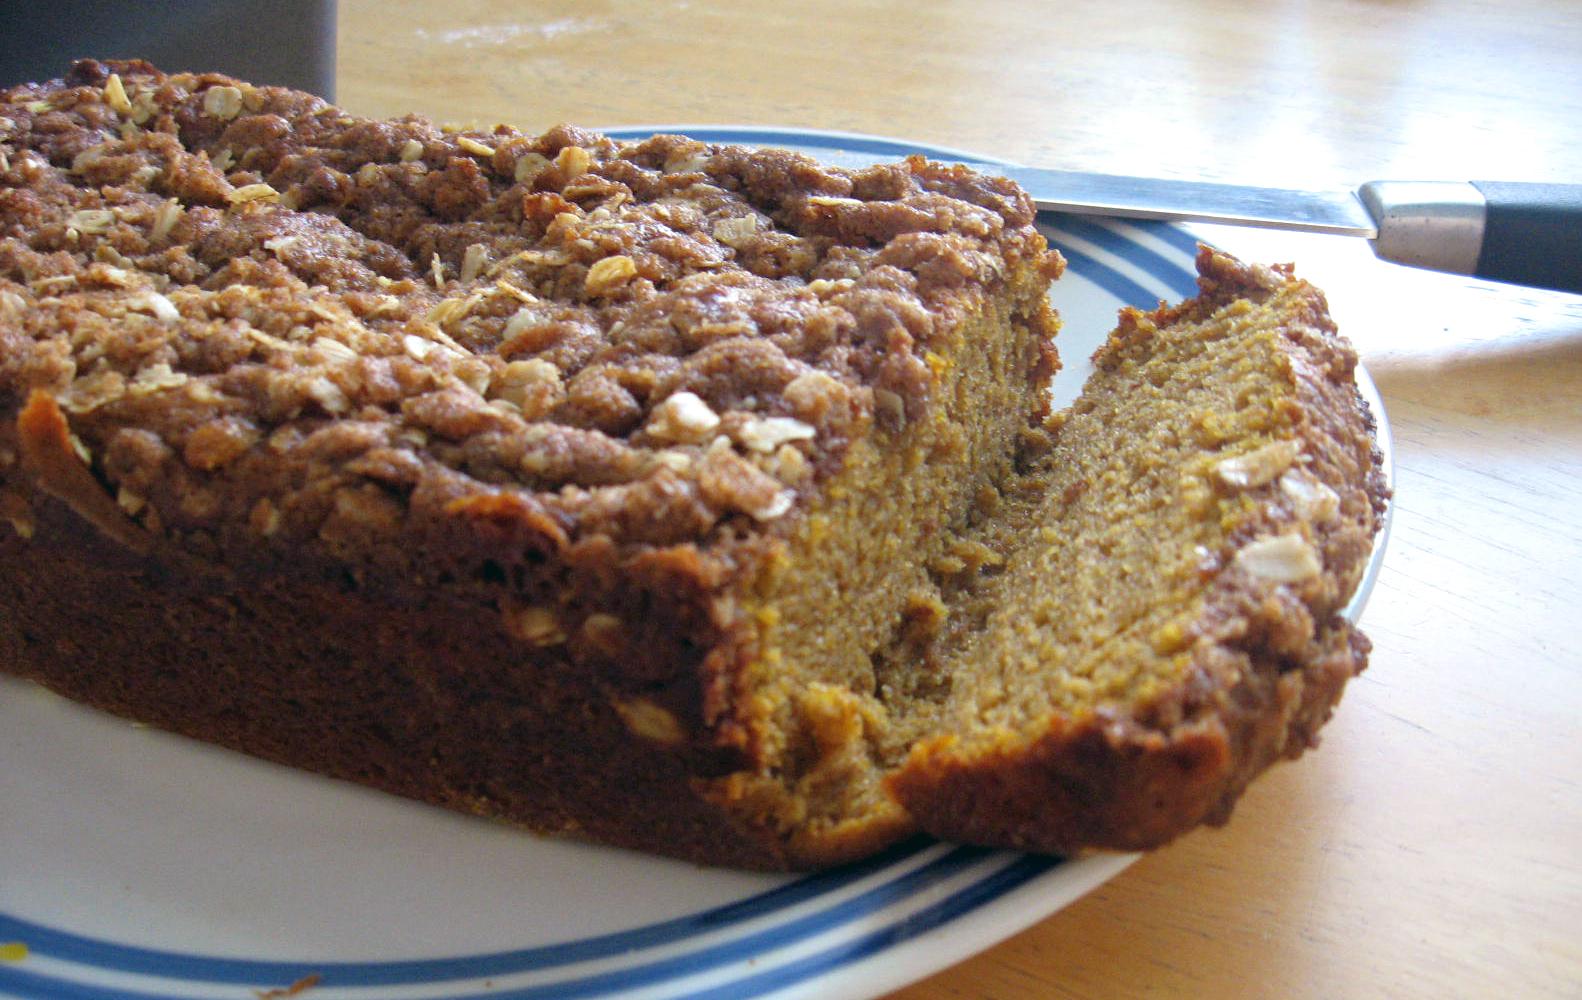 Streusel Topped Pumpkin Bread by freshfromthe.com